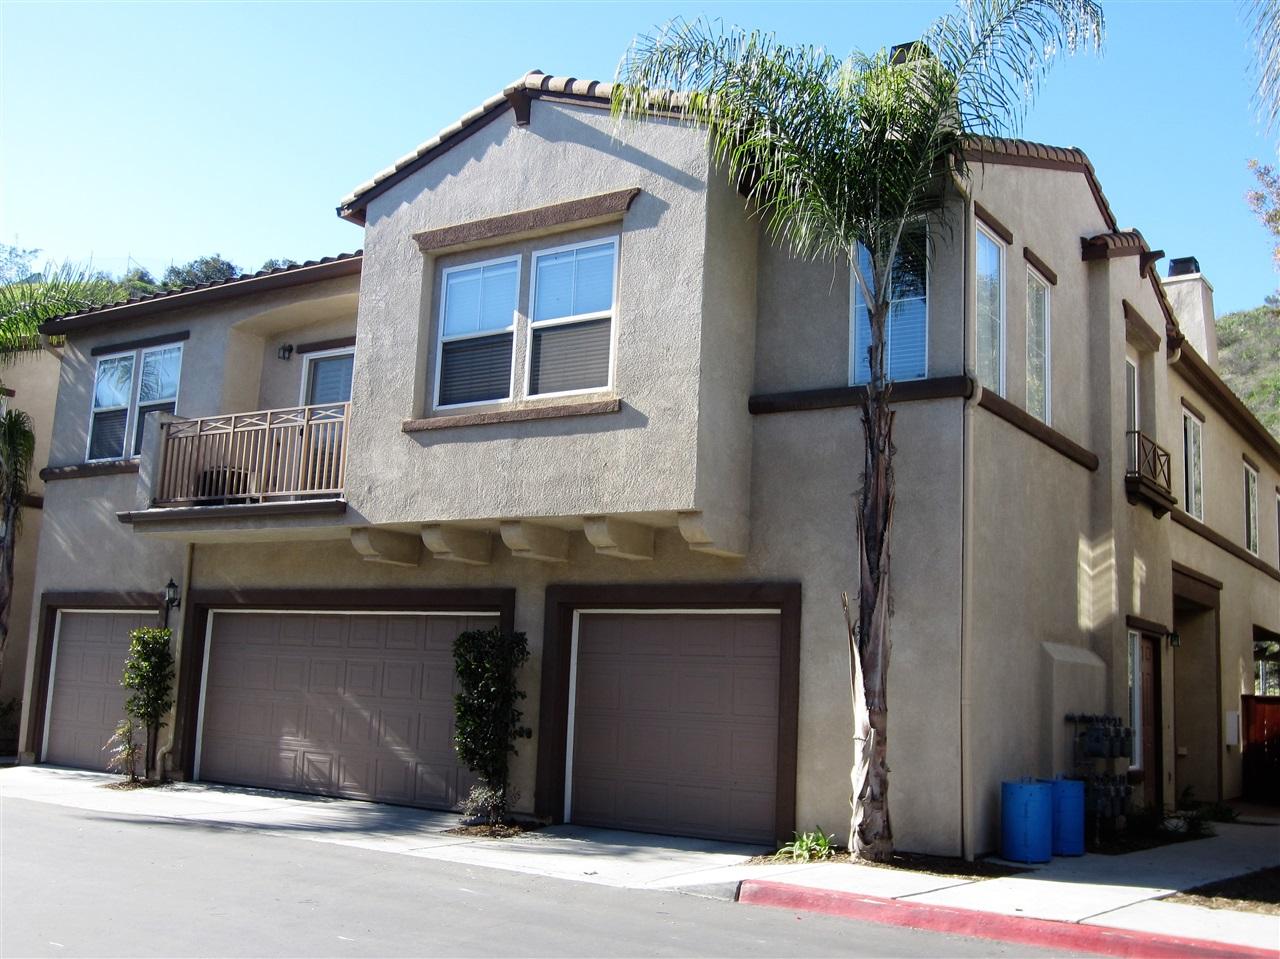 6293 Avenida De Las Vistas #APT 6, San Diego, CA